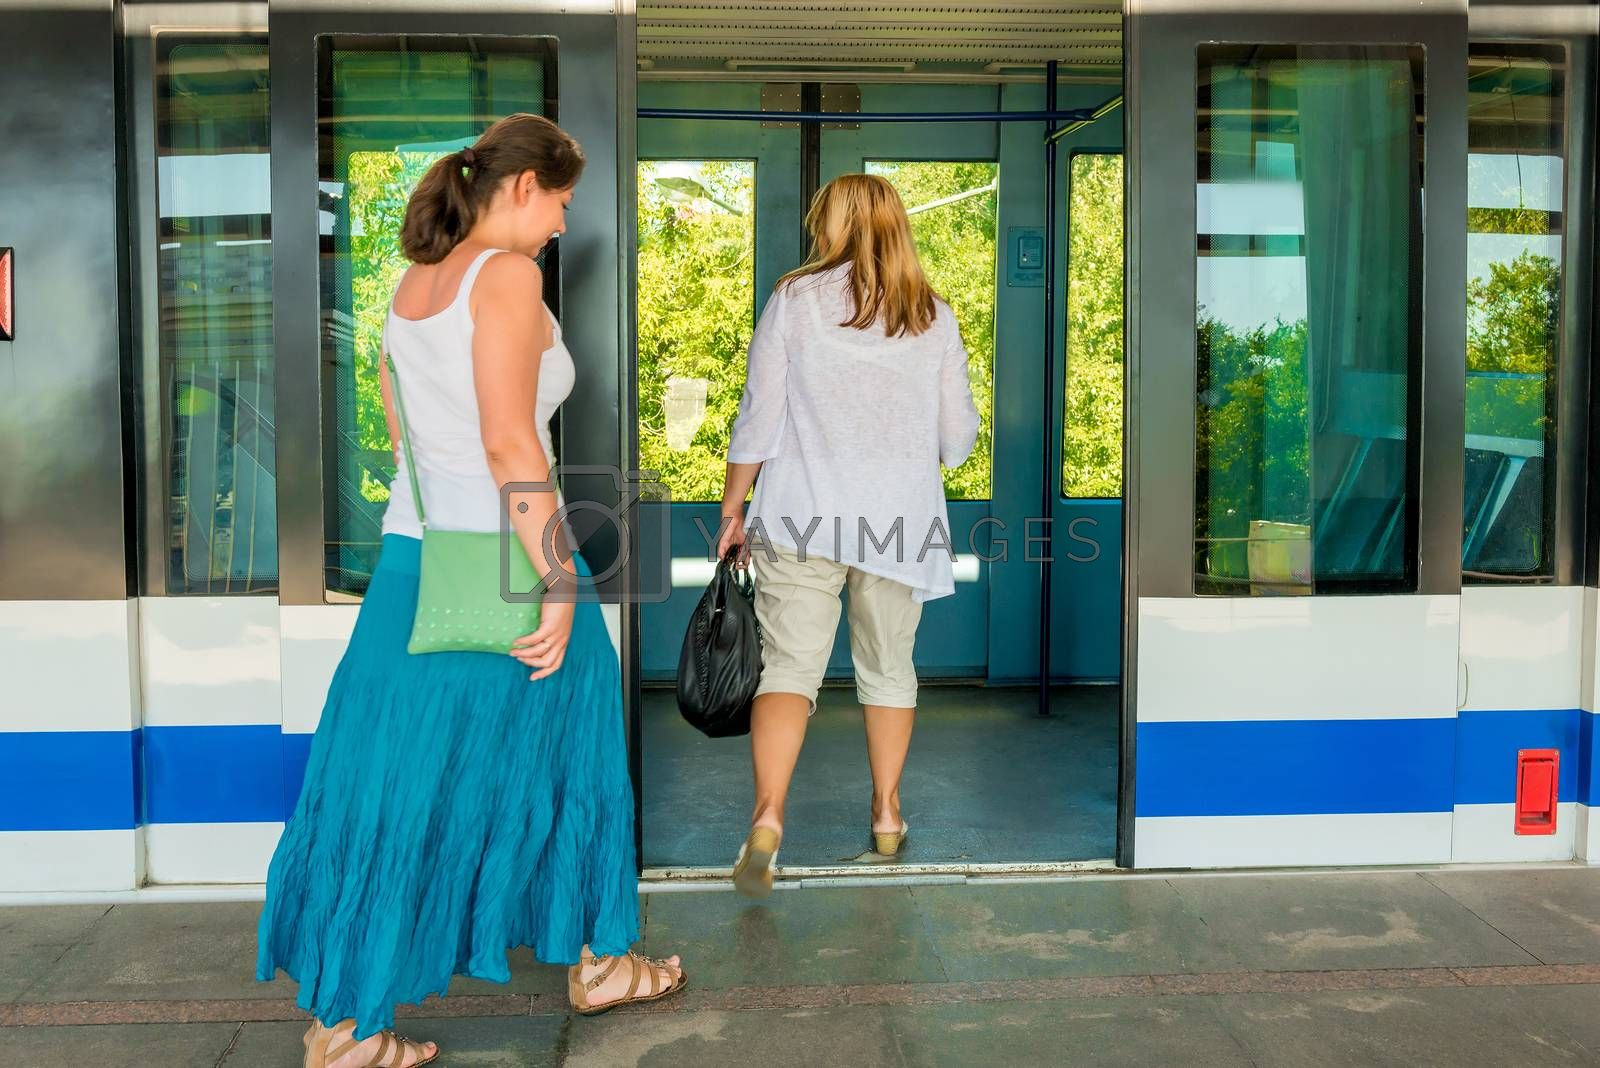 Passengers enter the doors of subway train